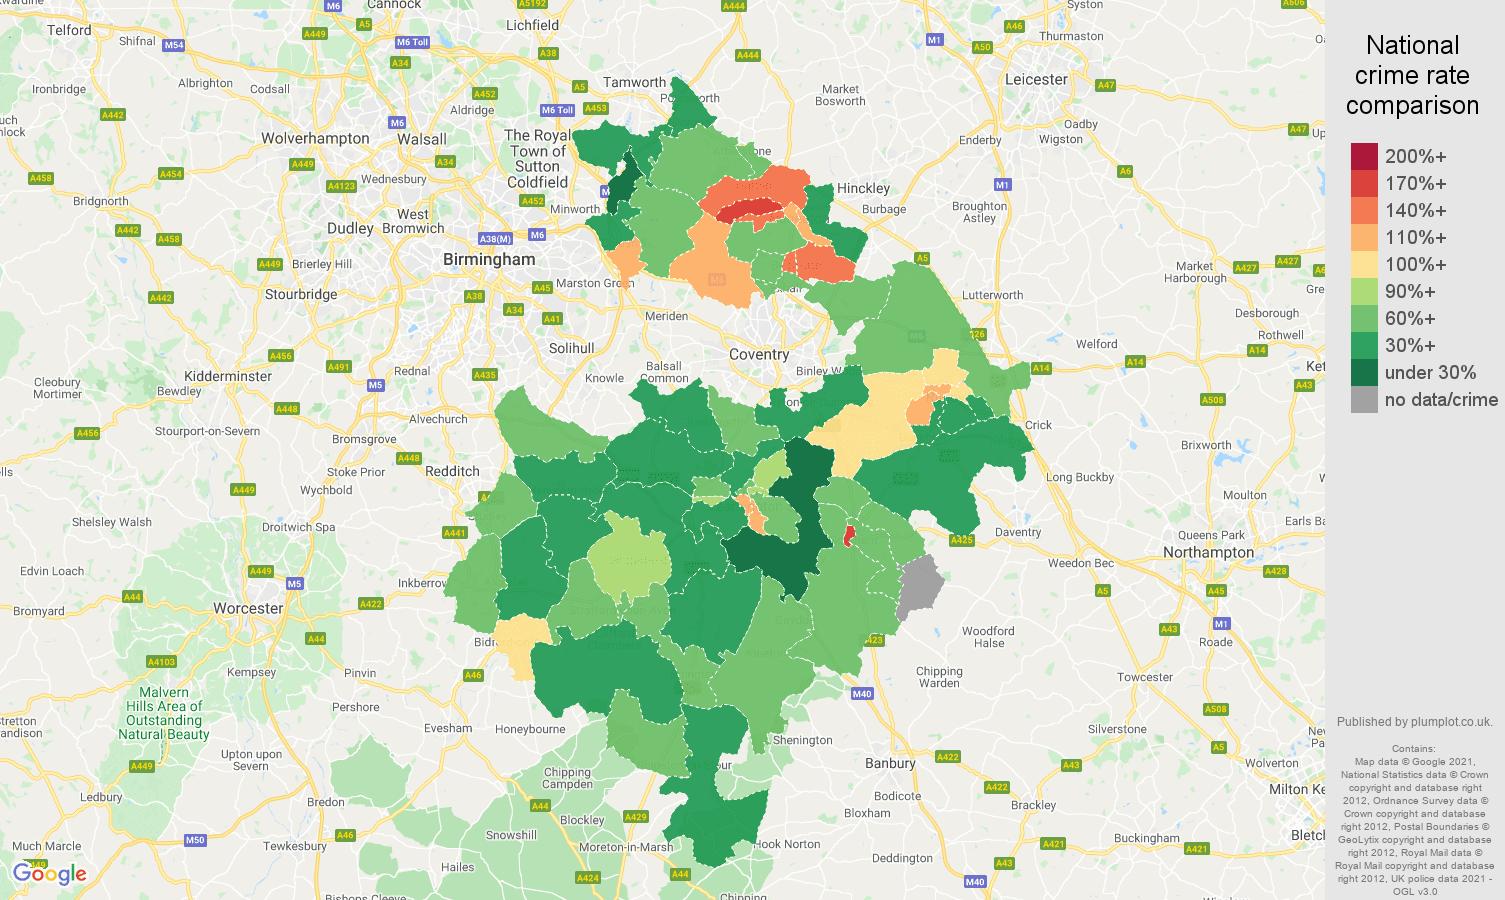 Warwickshire criminal damage and arson crime rate comparison map